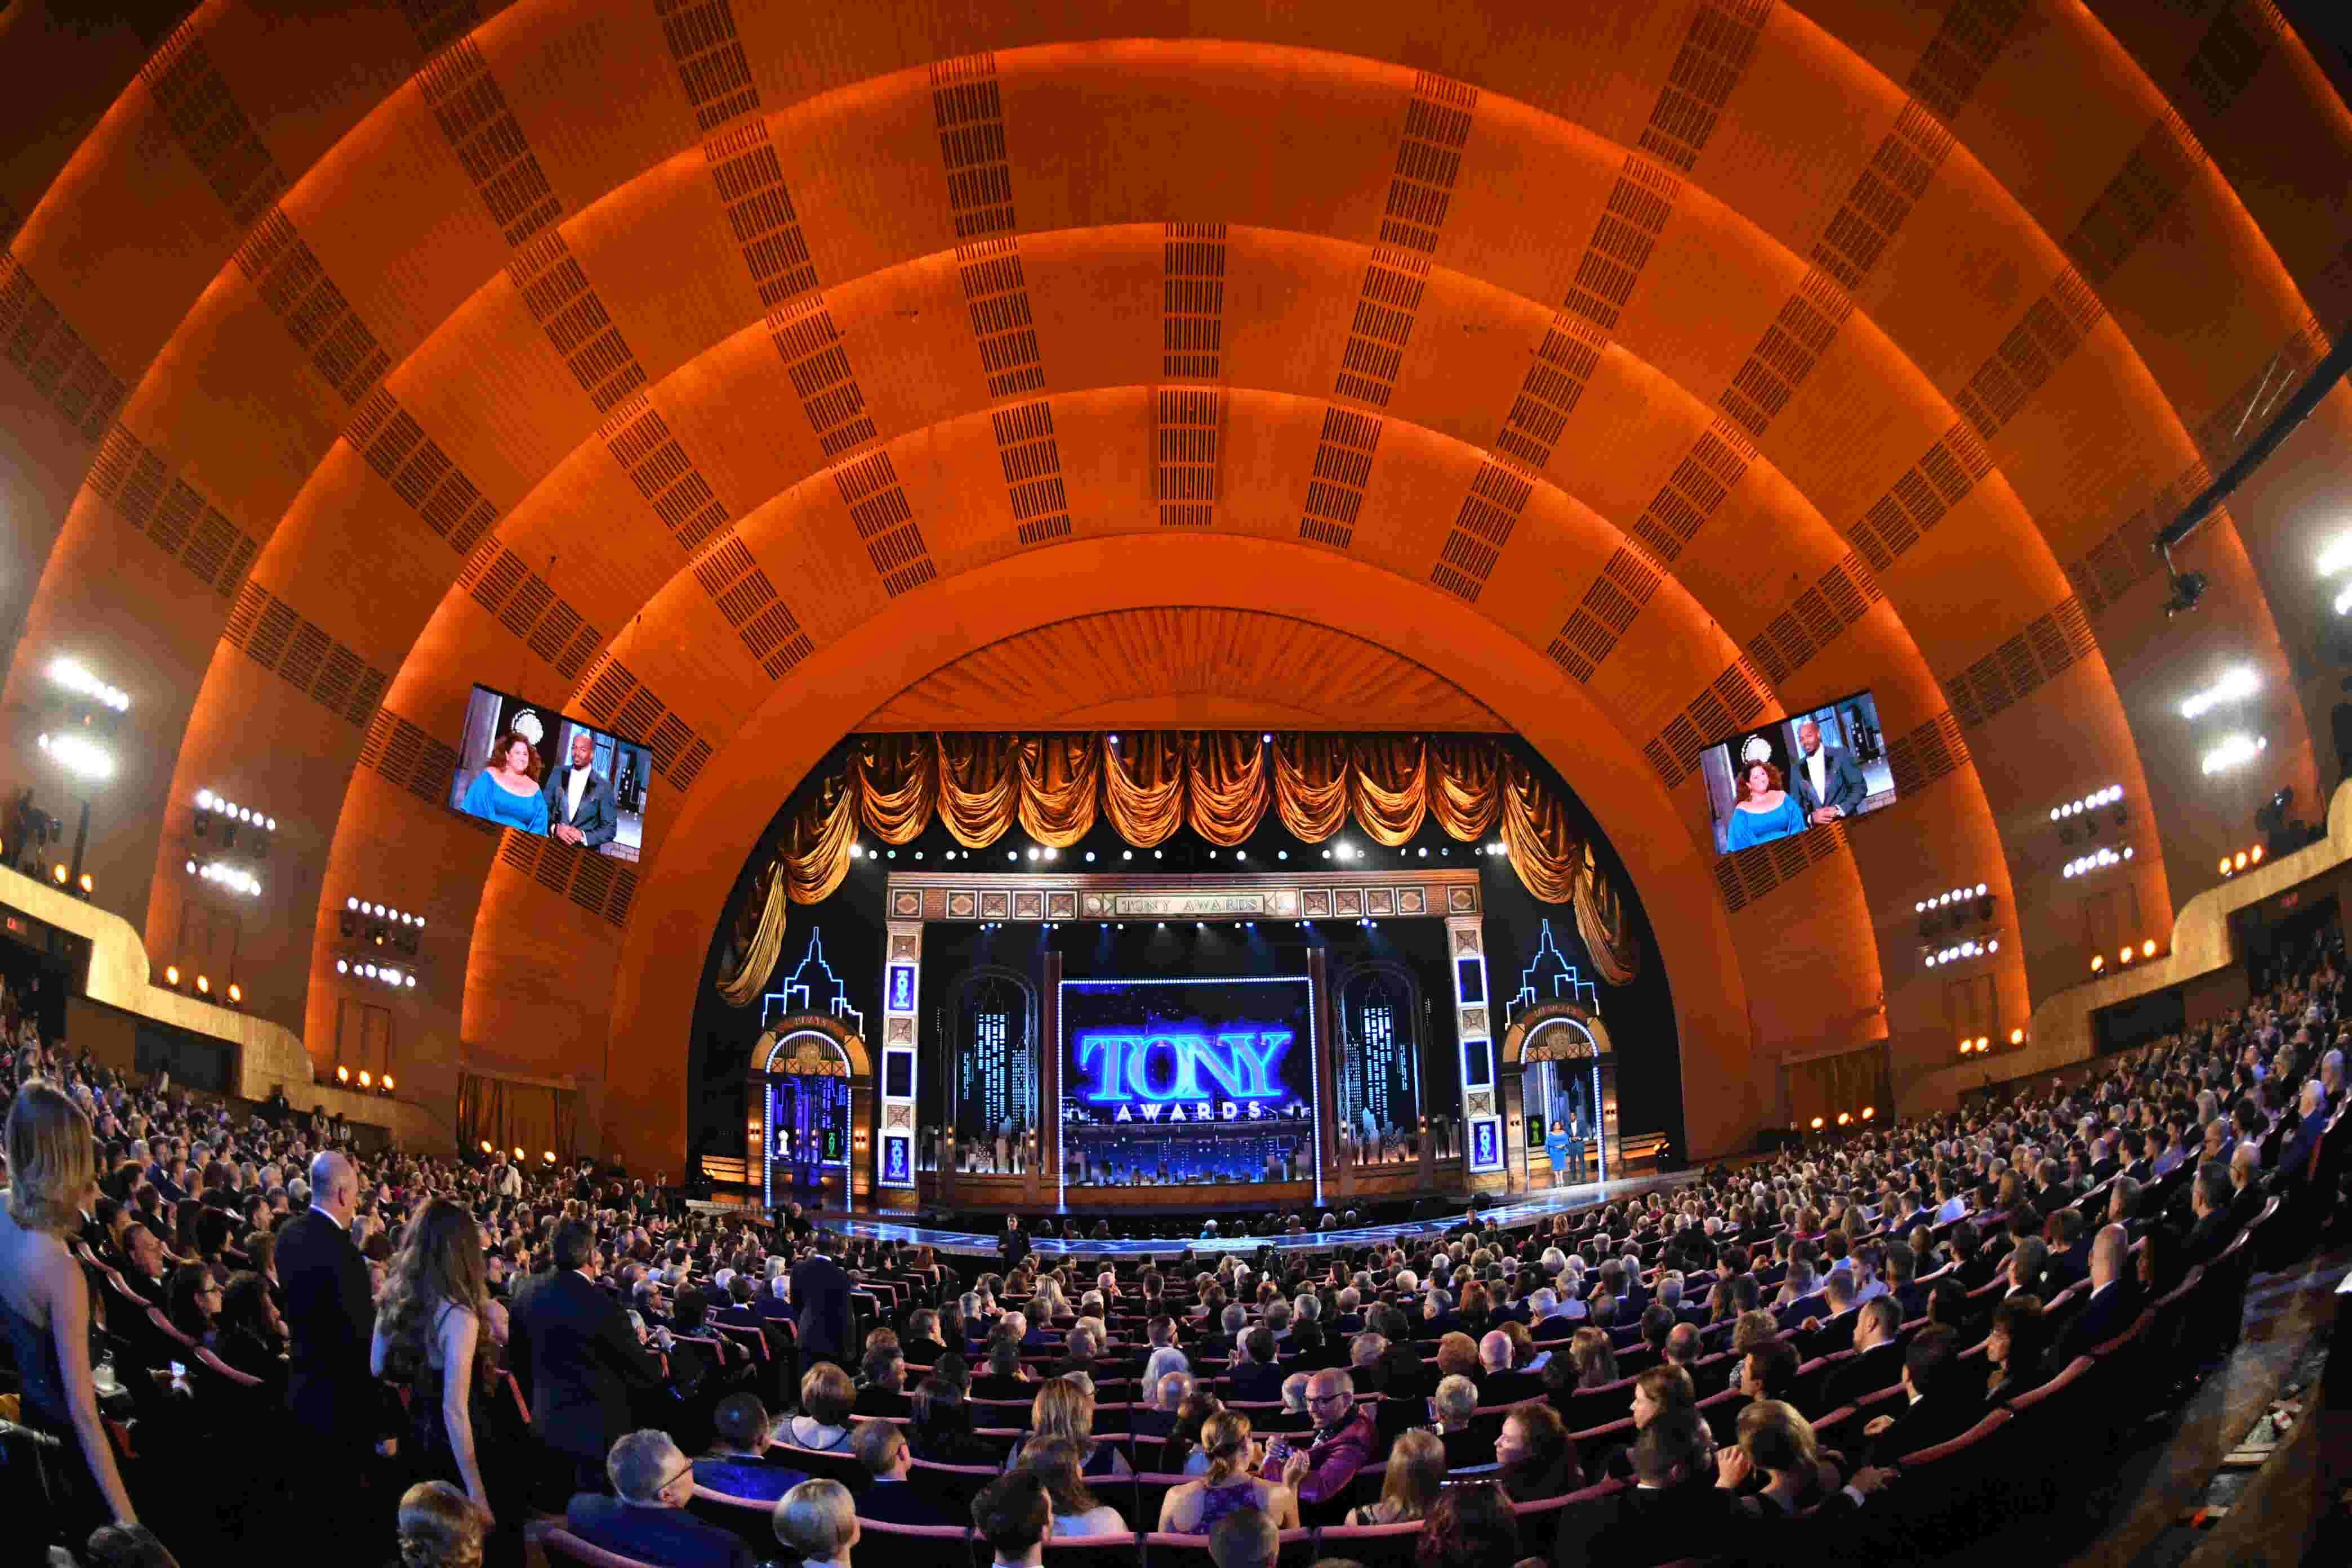 Tony Awards: Parkland students give powerful 'Seasons of